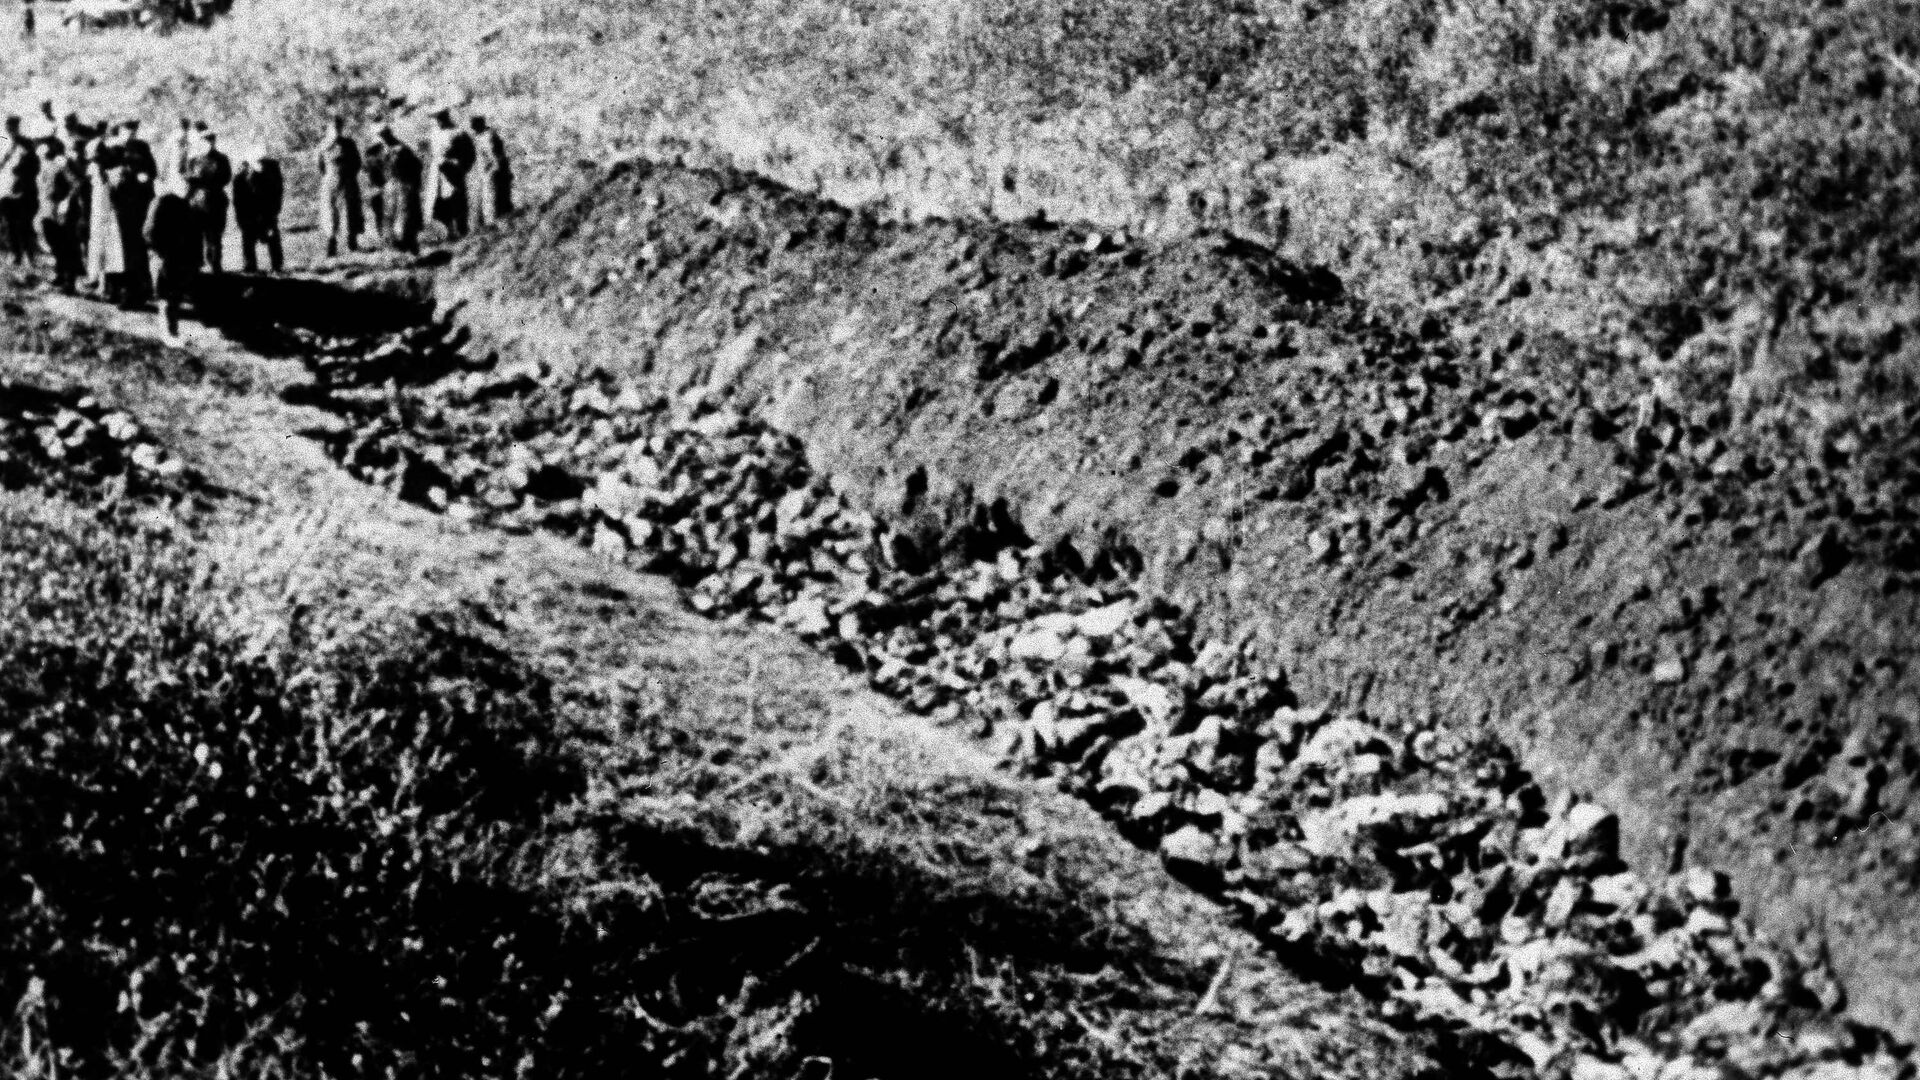 Бабий Яр. 1944 год  - РИА Новости, 1920, 06.10.2021